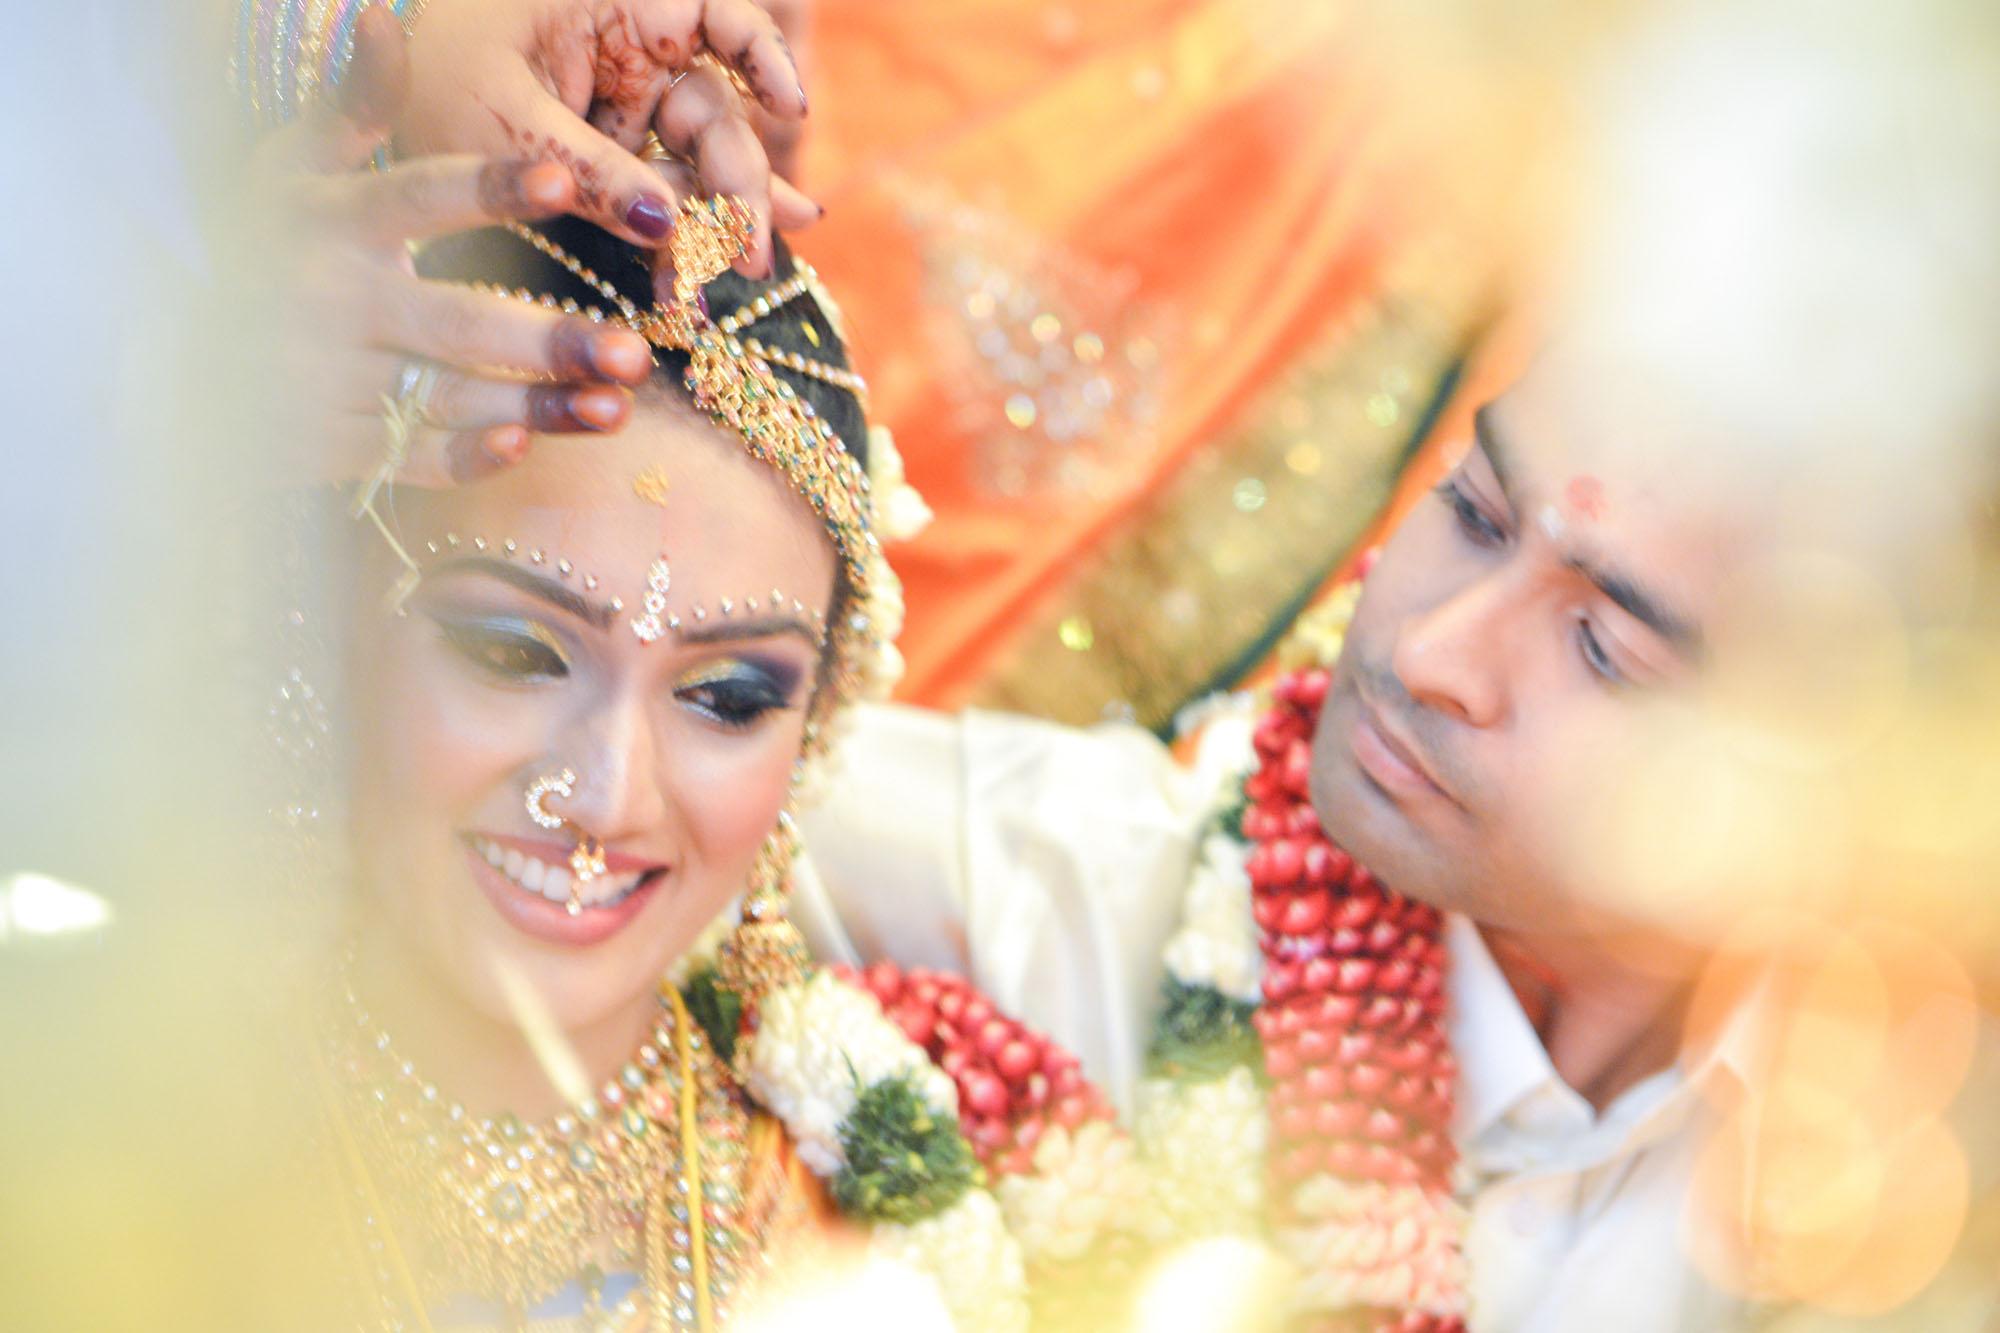 Amore_Production_Indian_Wedding_Photographer (1)